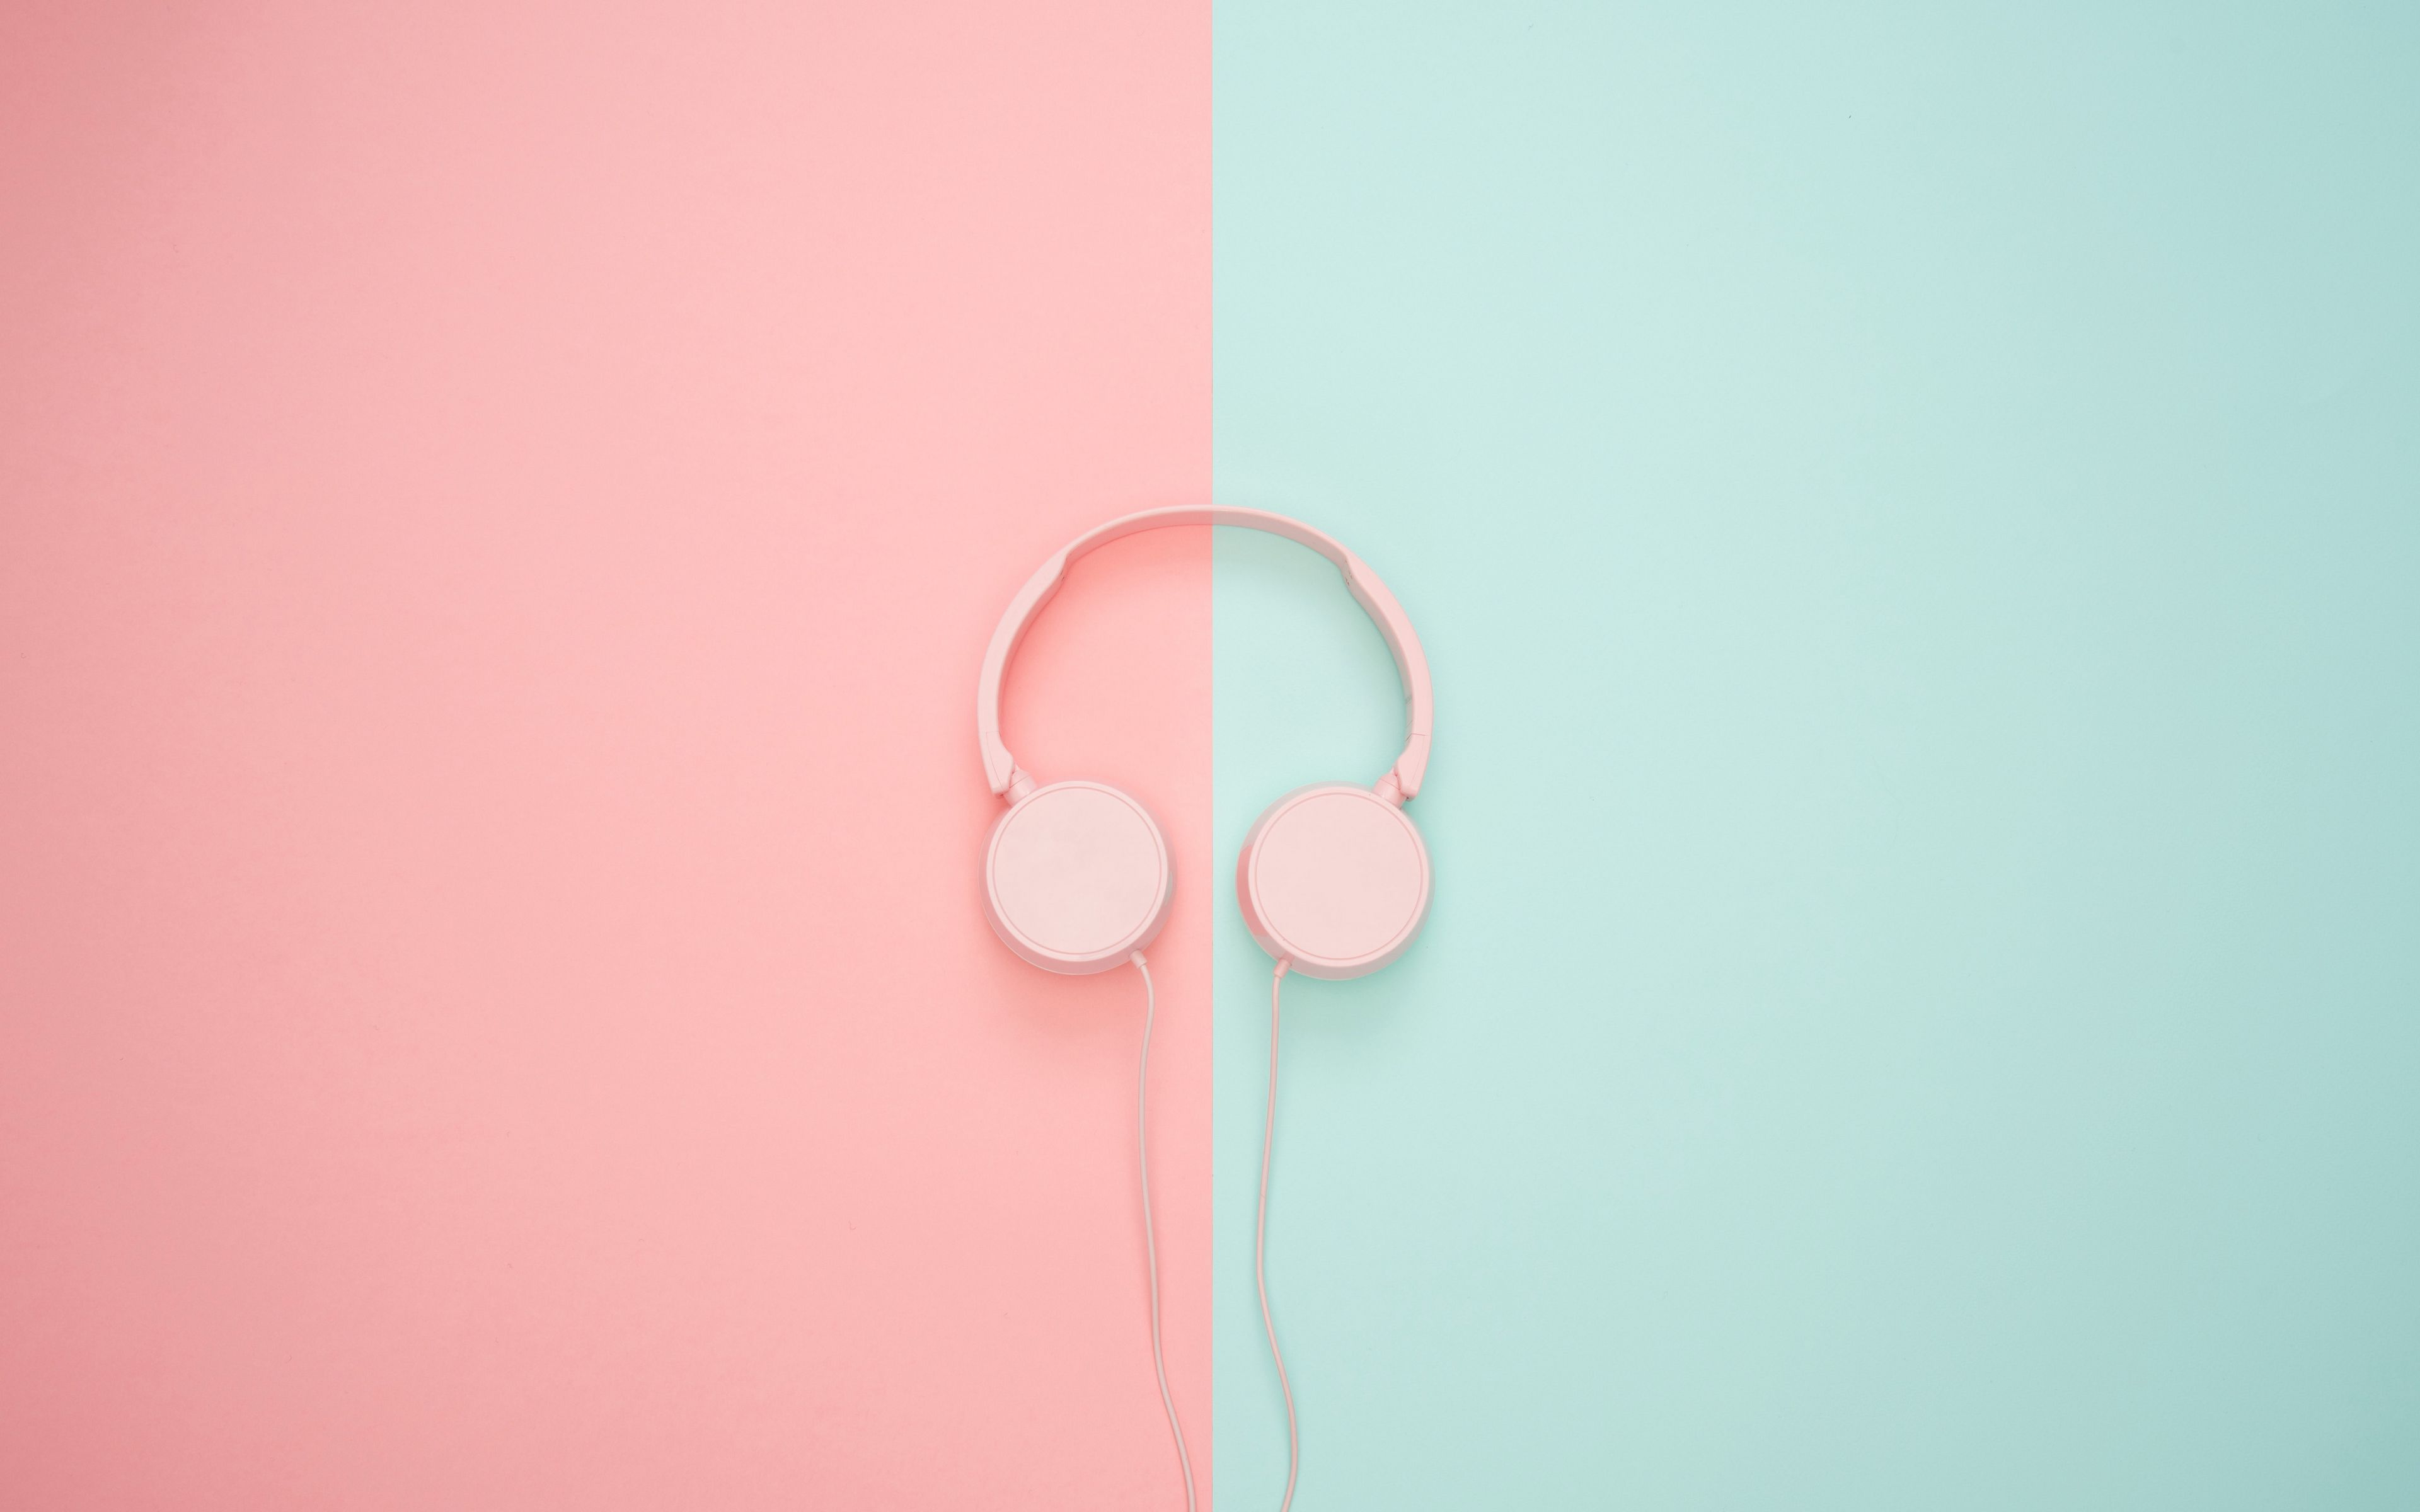 3840x2400 Wallpaper headphones, minimalism, pink, pastel